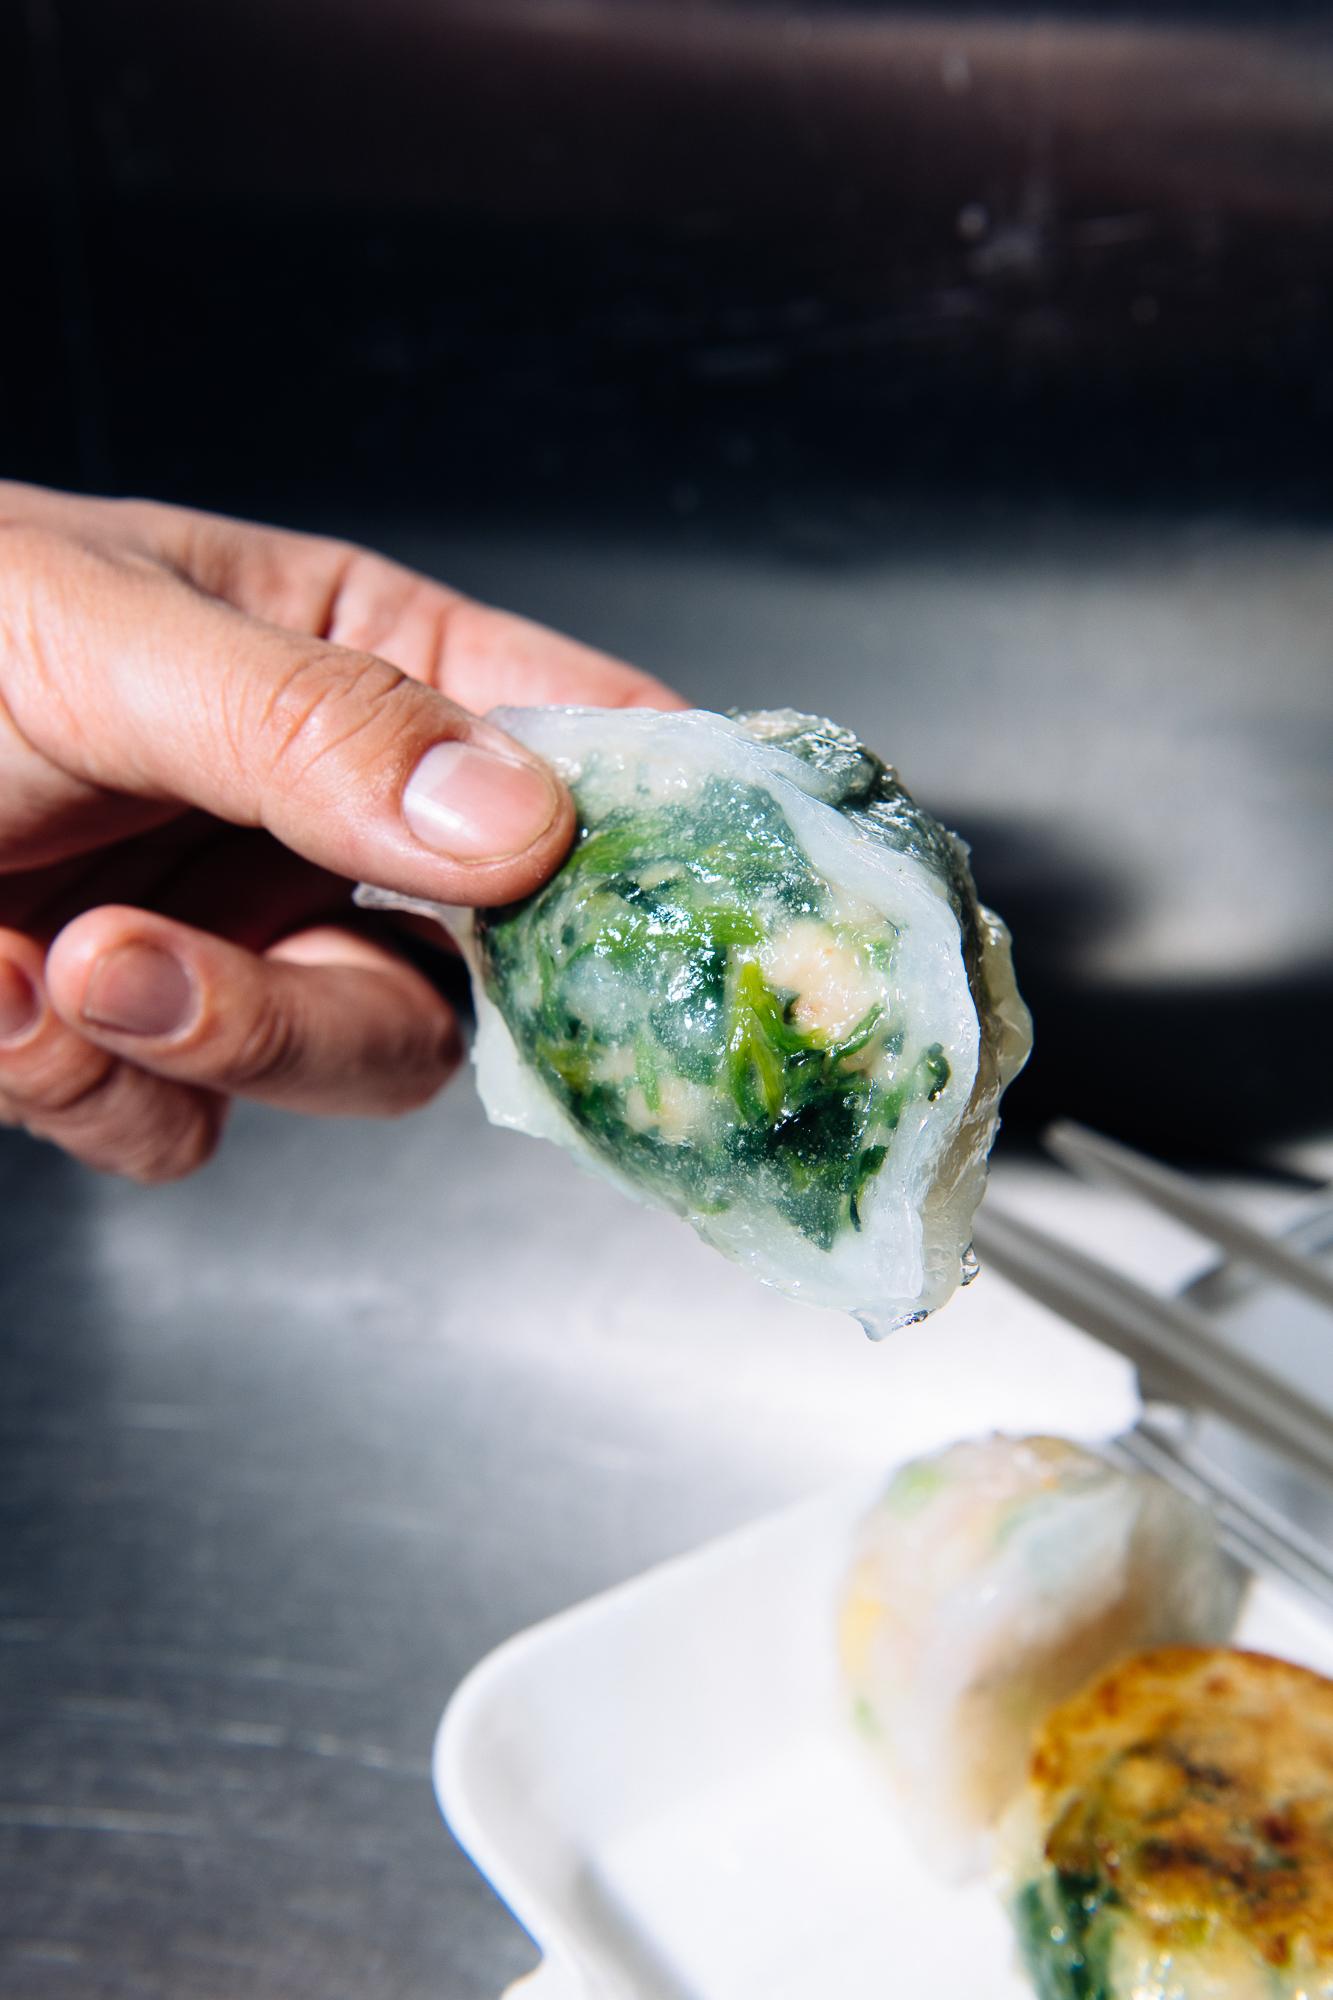 Watercress and shrimp crystal dumplings at Corner 28 in Flushing, Queens